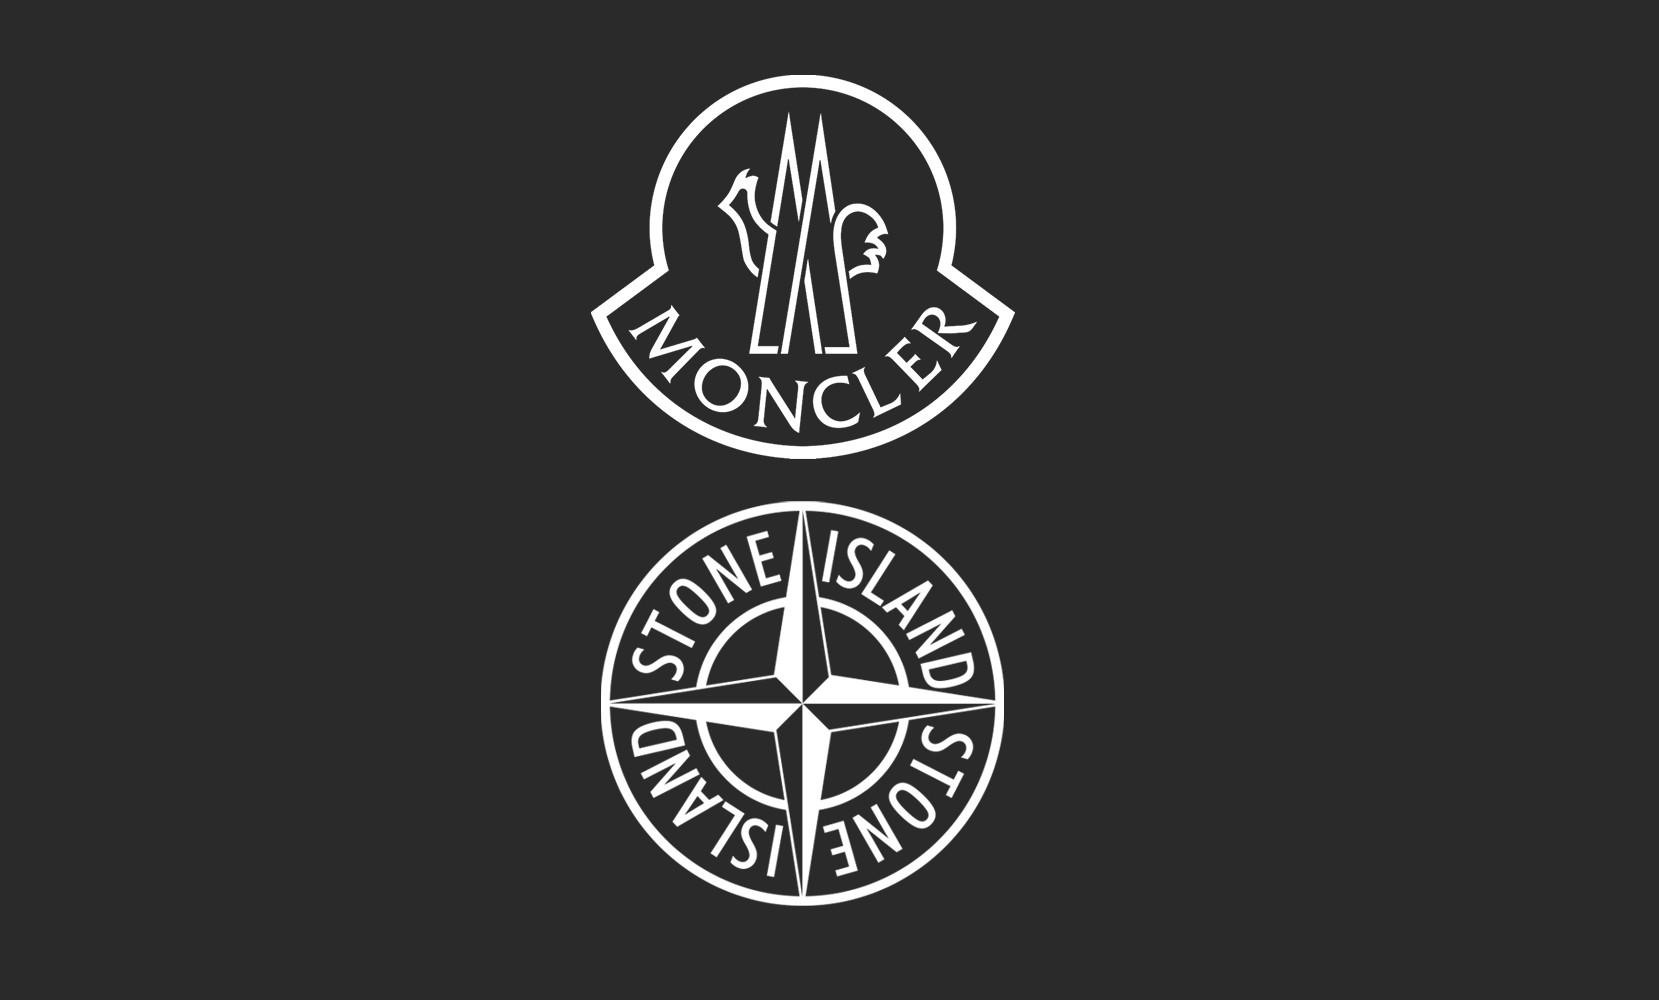 Moncler Stone Island